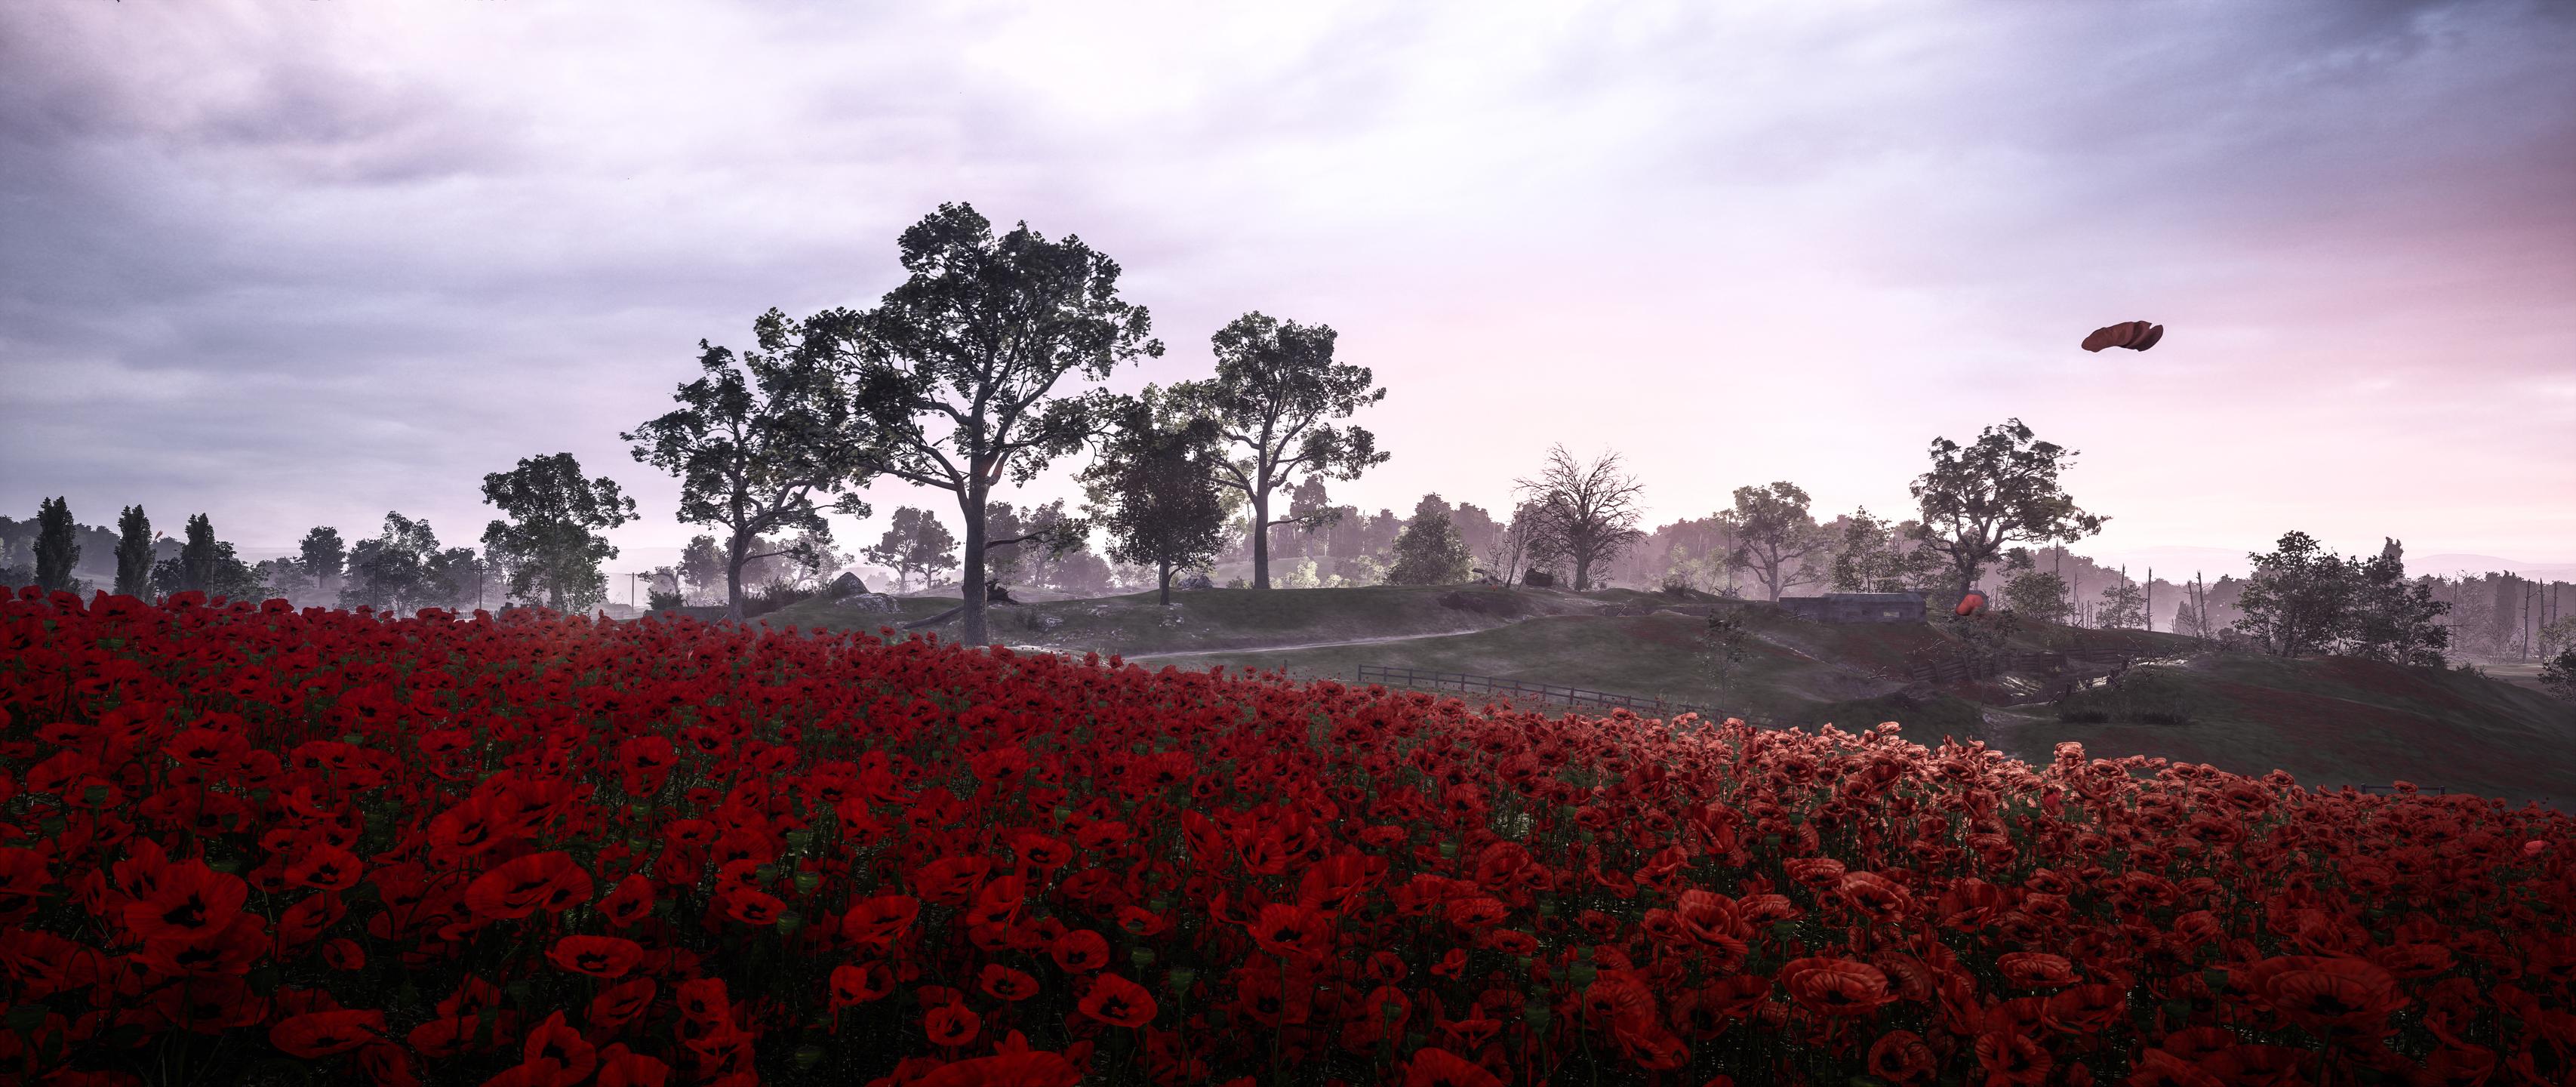 Poppy Wallpaper For Iphone Battlefield 1 Hd Wallpaper Background Image 3413x1440